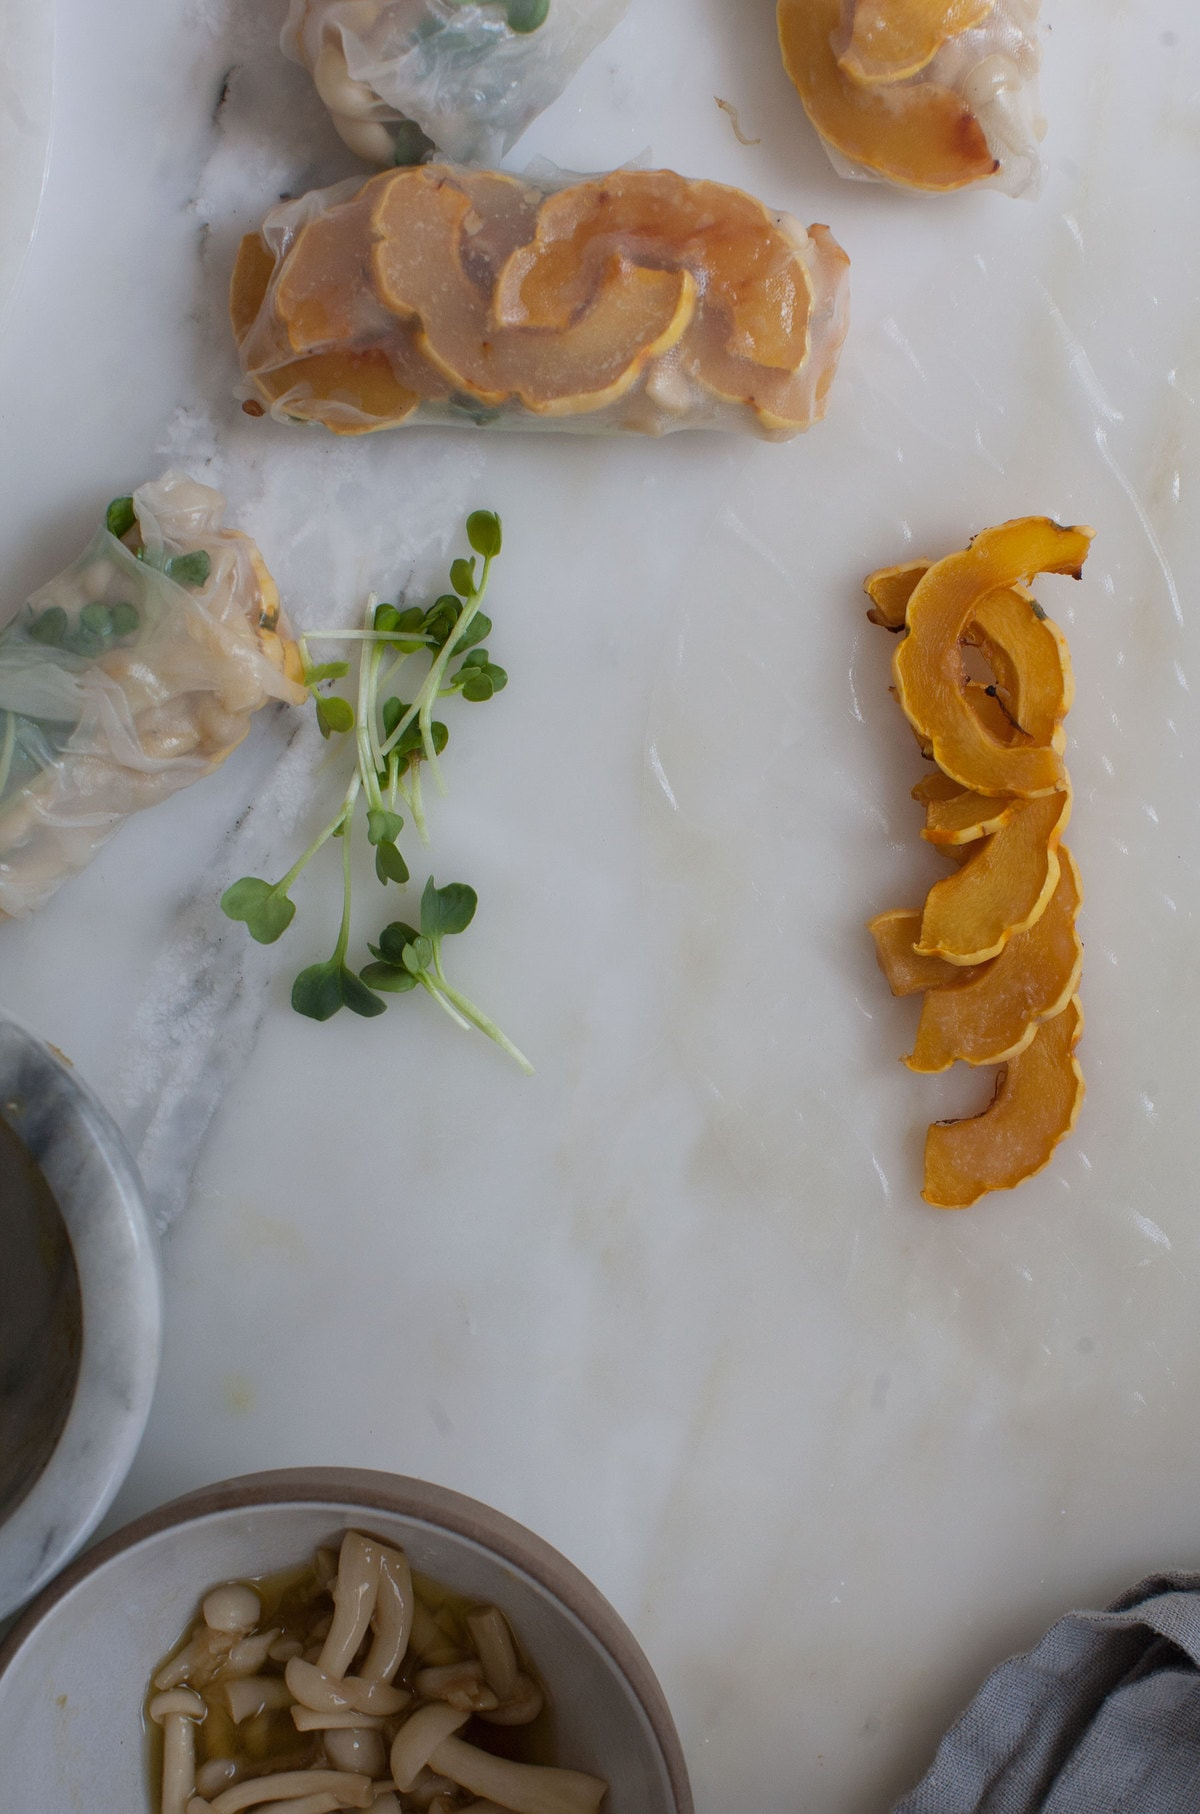 Fall Spring Rolls: Miso-Glazed Delicata Squash, Radish Sprouts and Brown Sugar Mushrooms